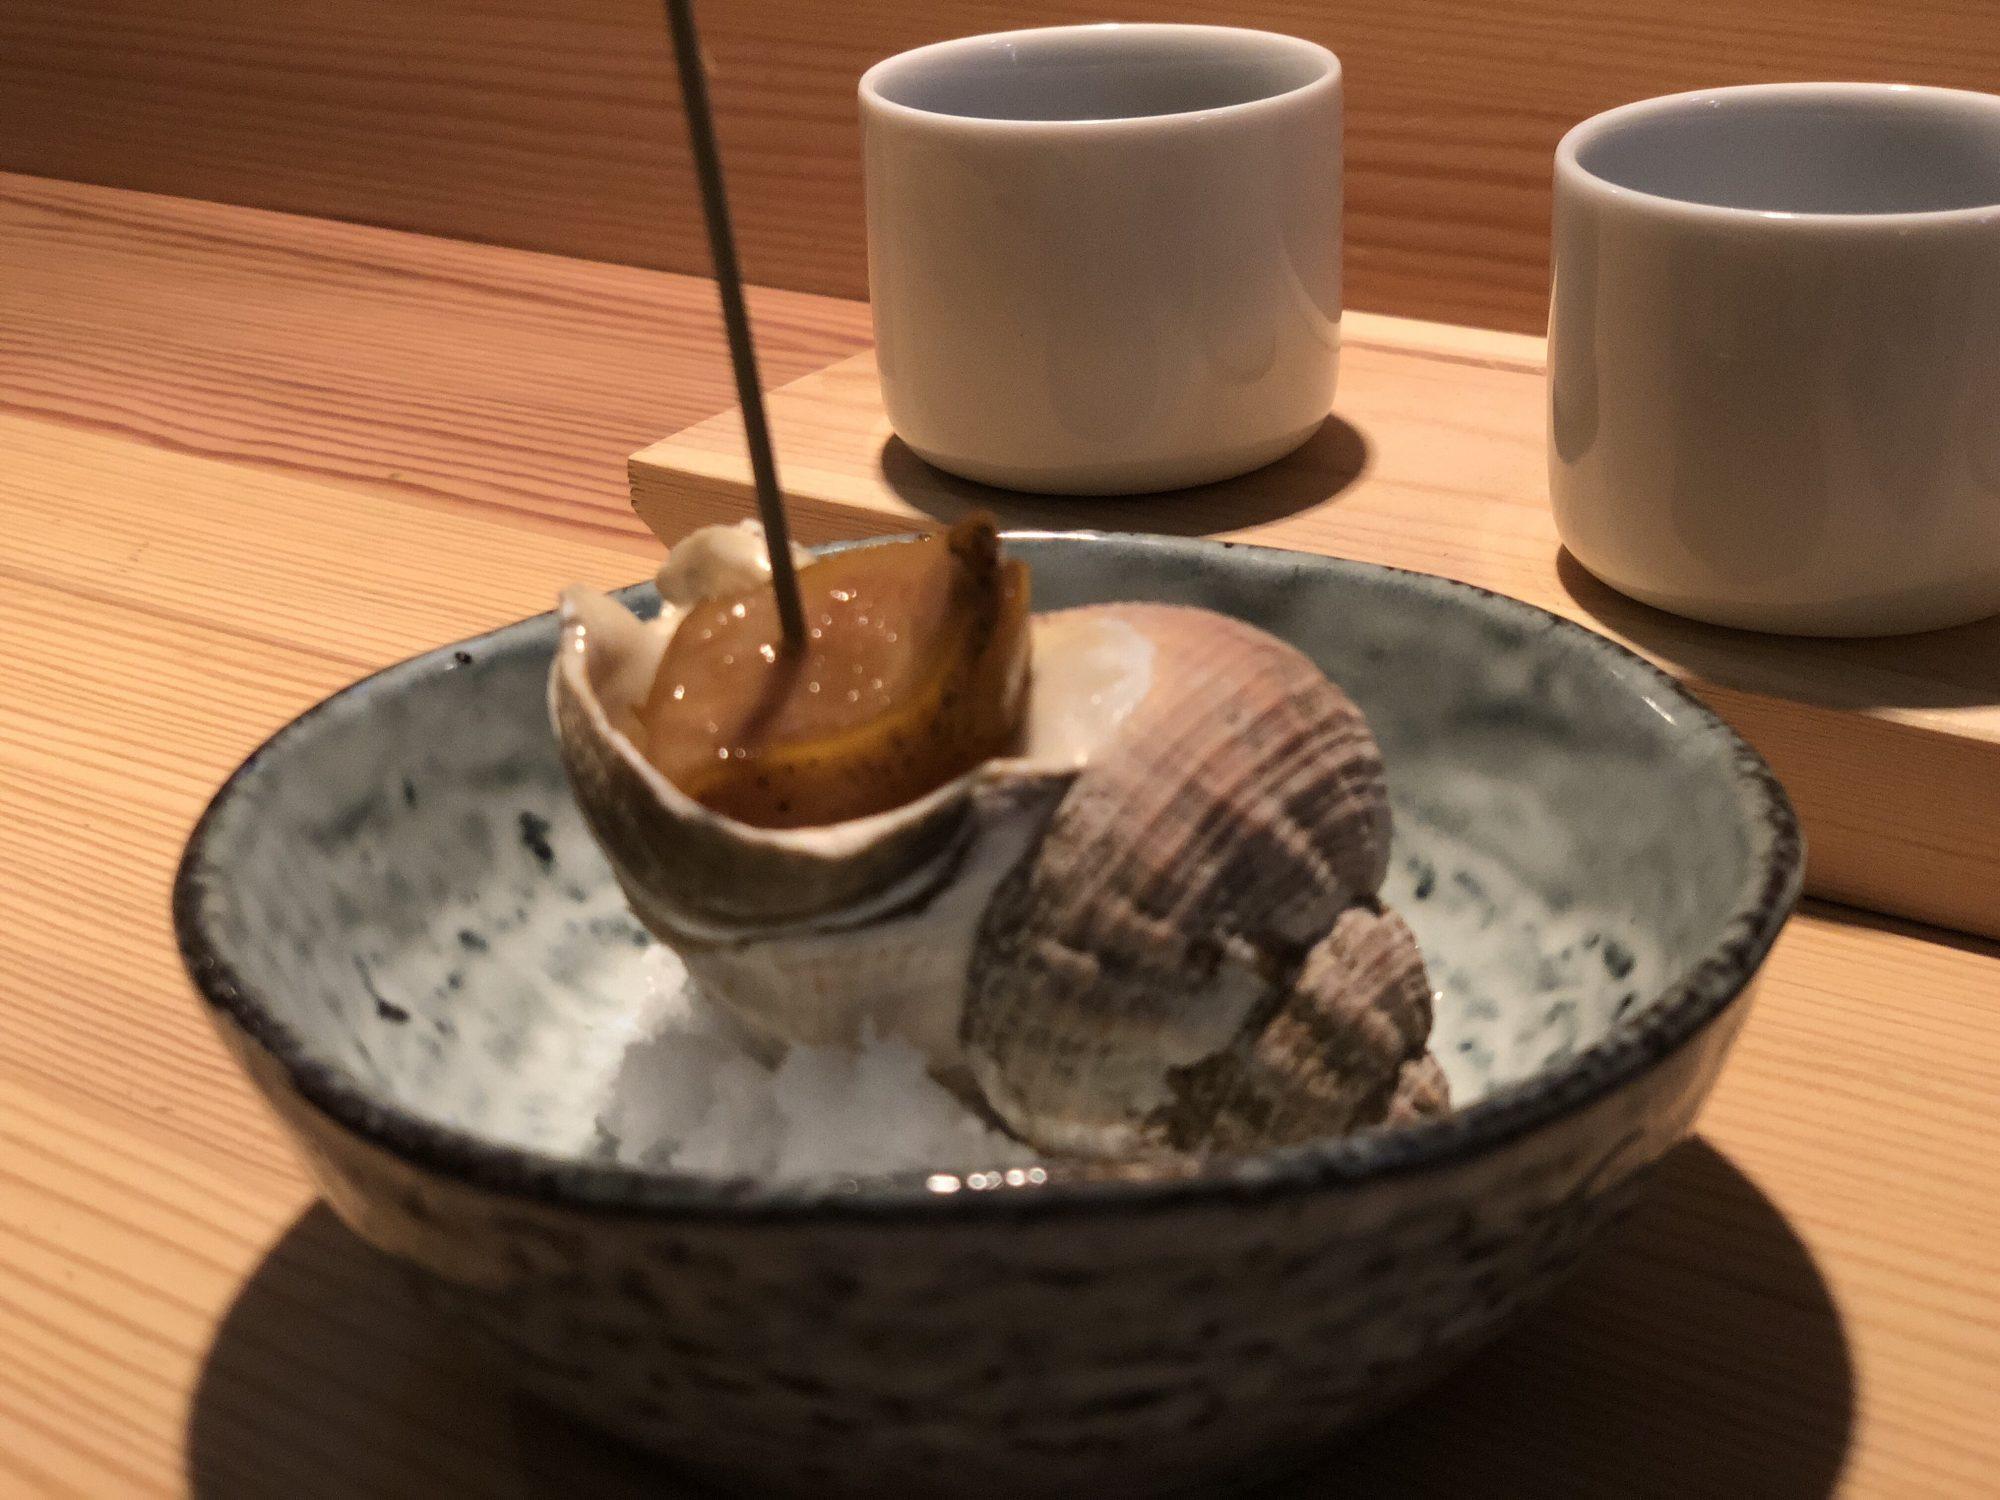 Avsmakningsmeny på Sushi Oi